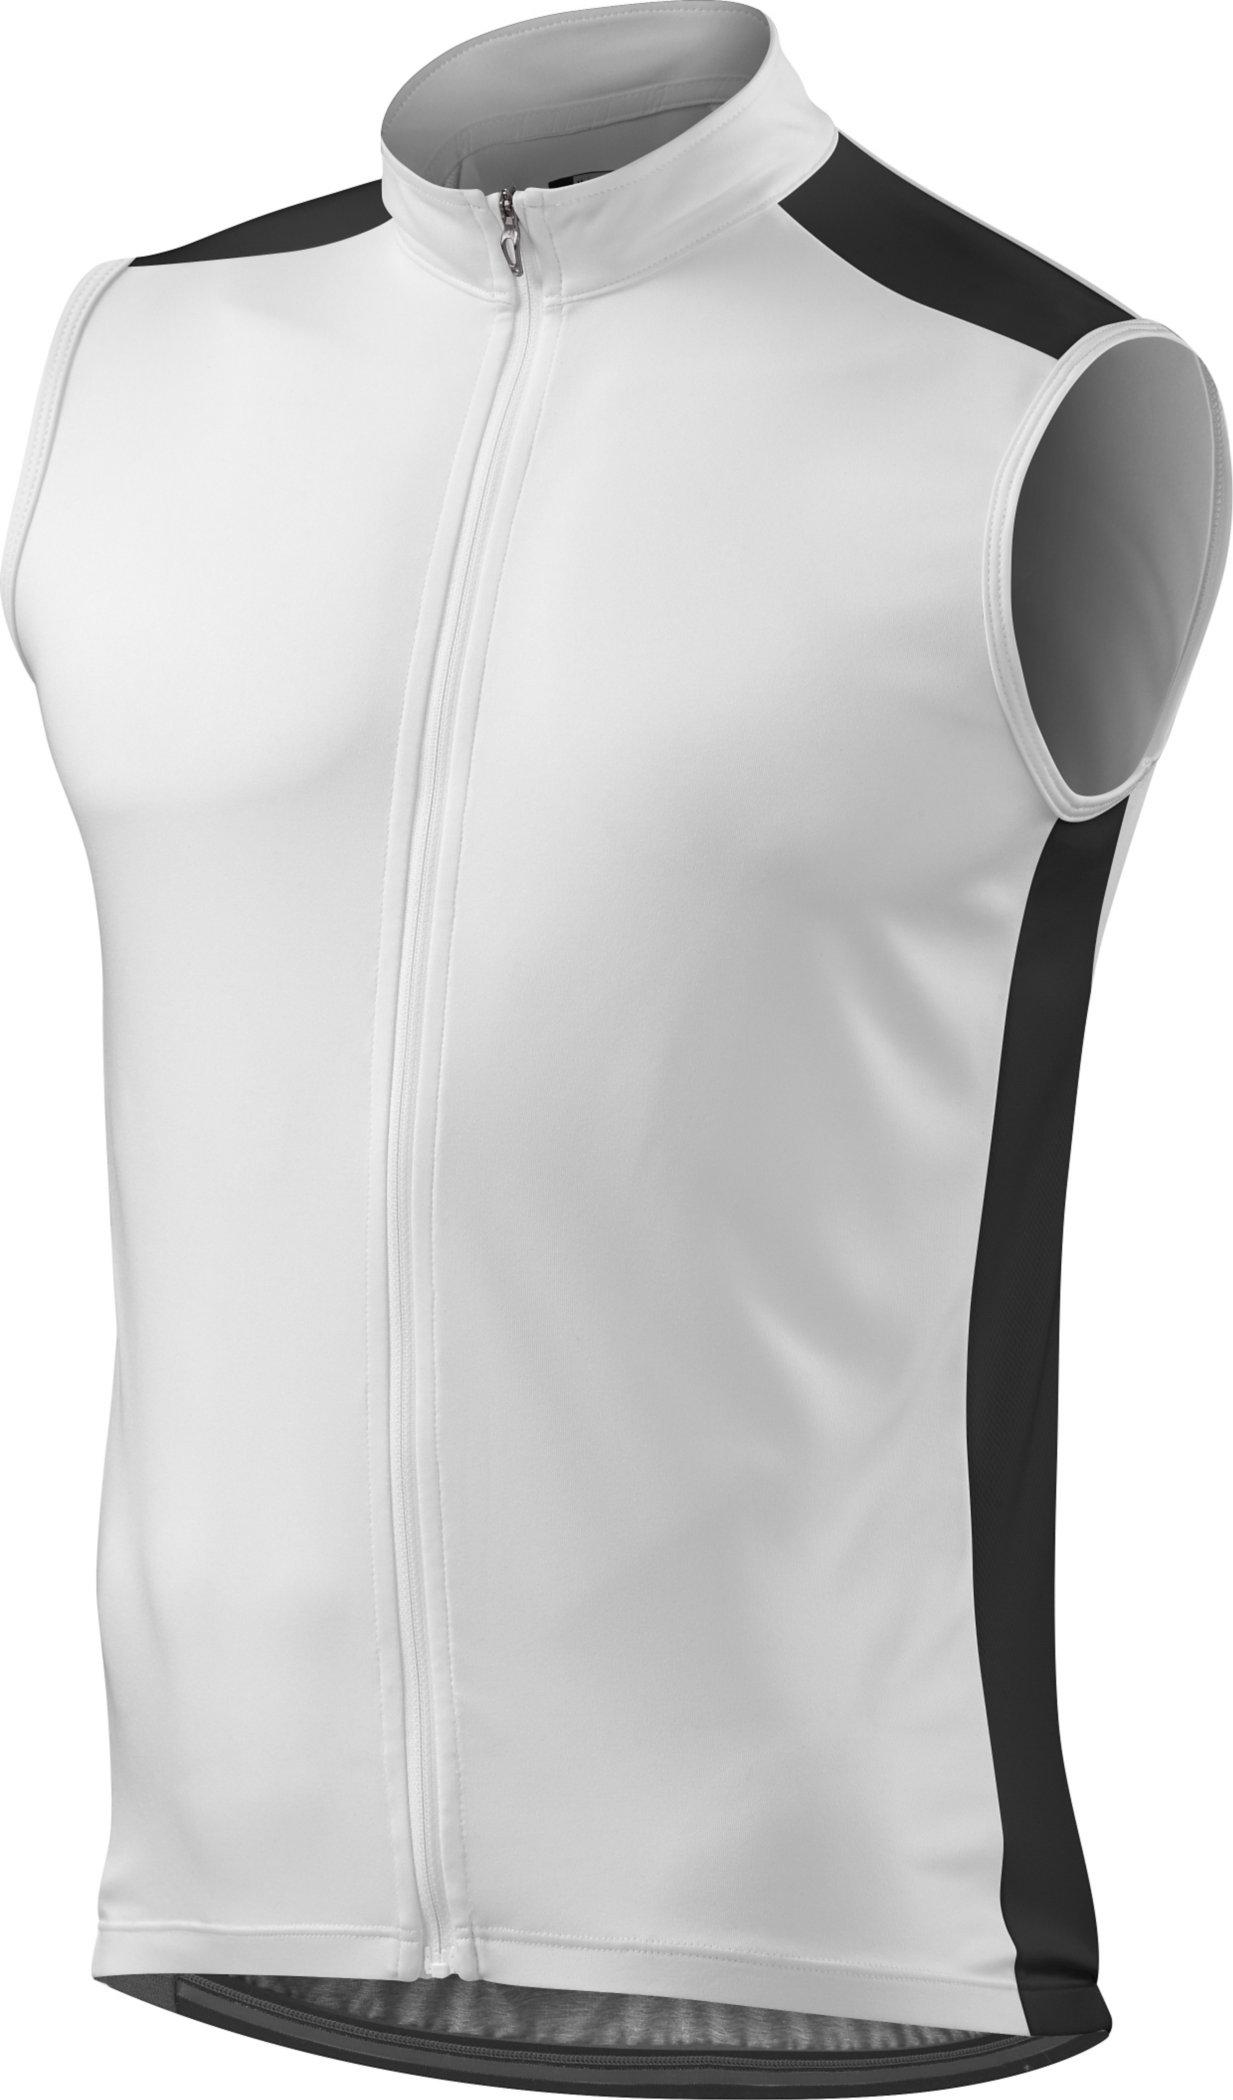 Specialized RBX Sport Sleeveless Jersey White/Black Medium - Alpha Bikes